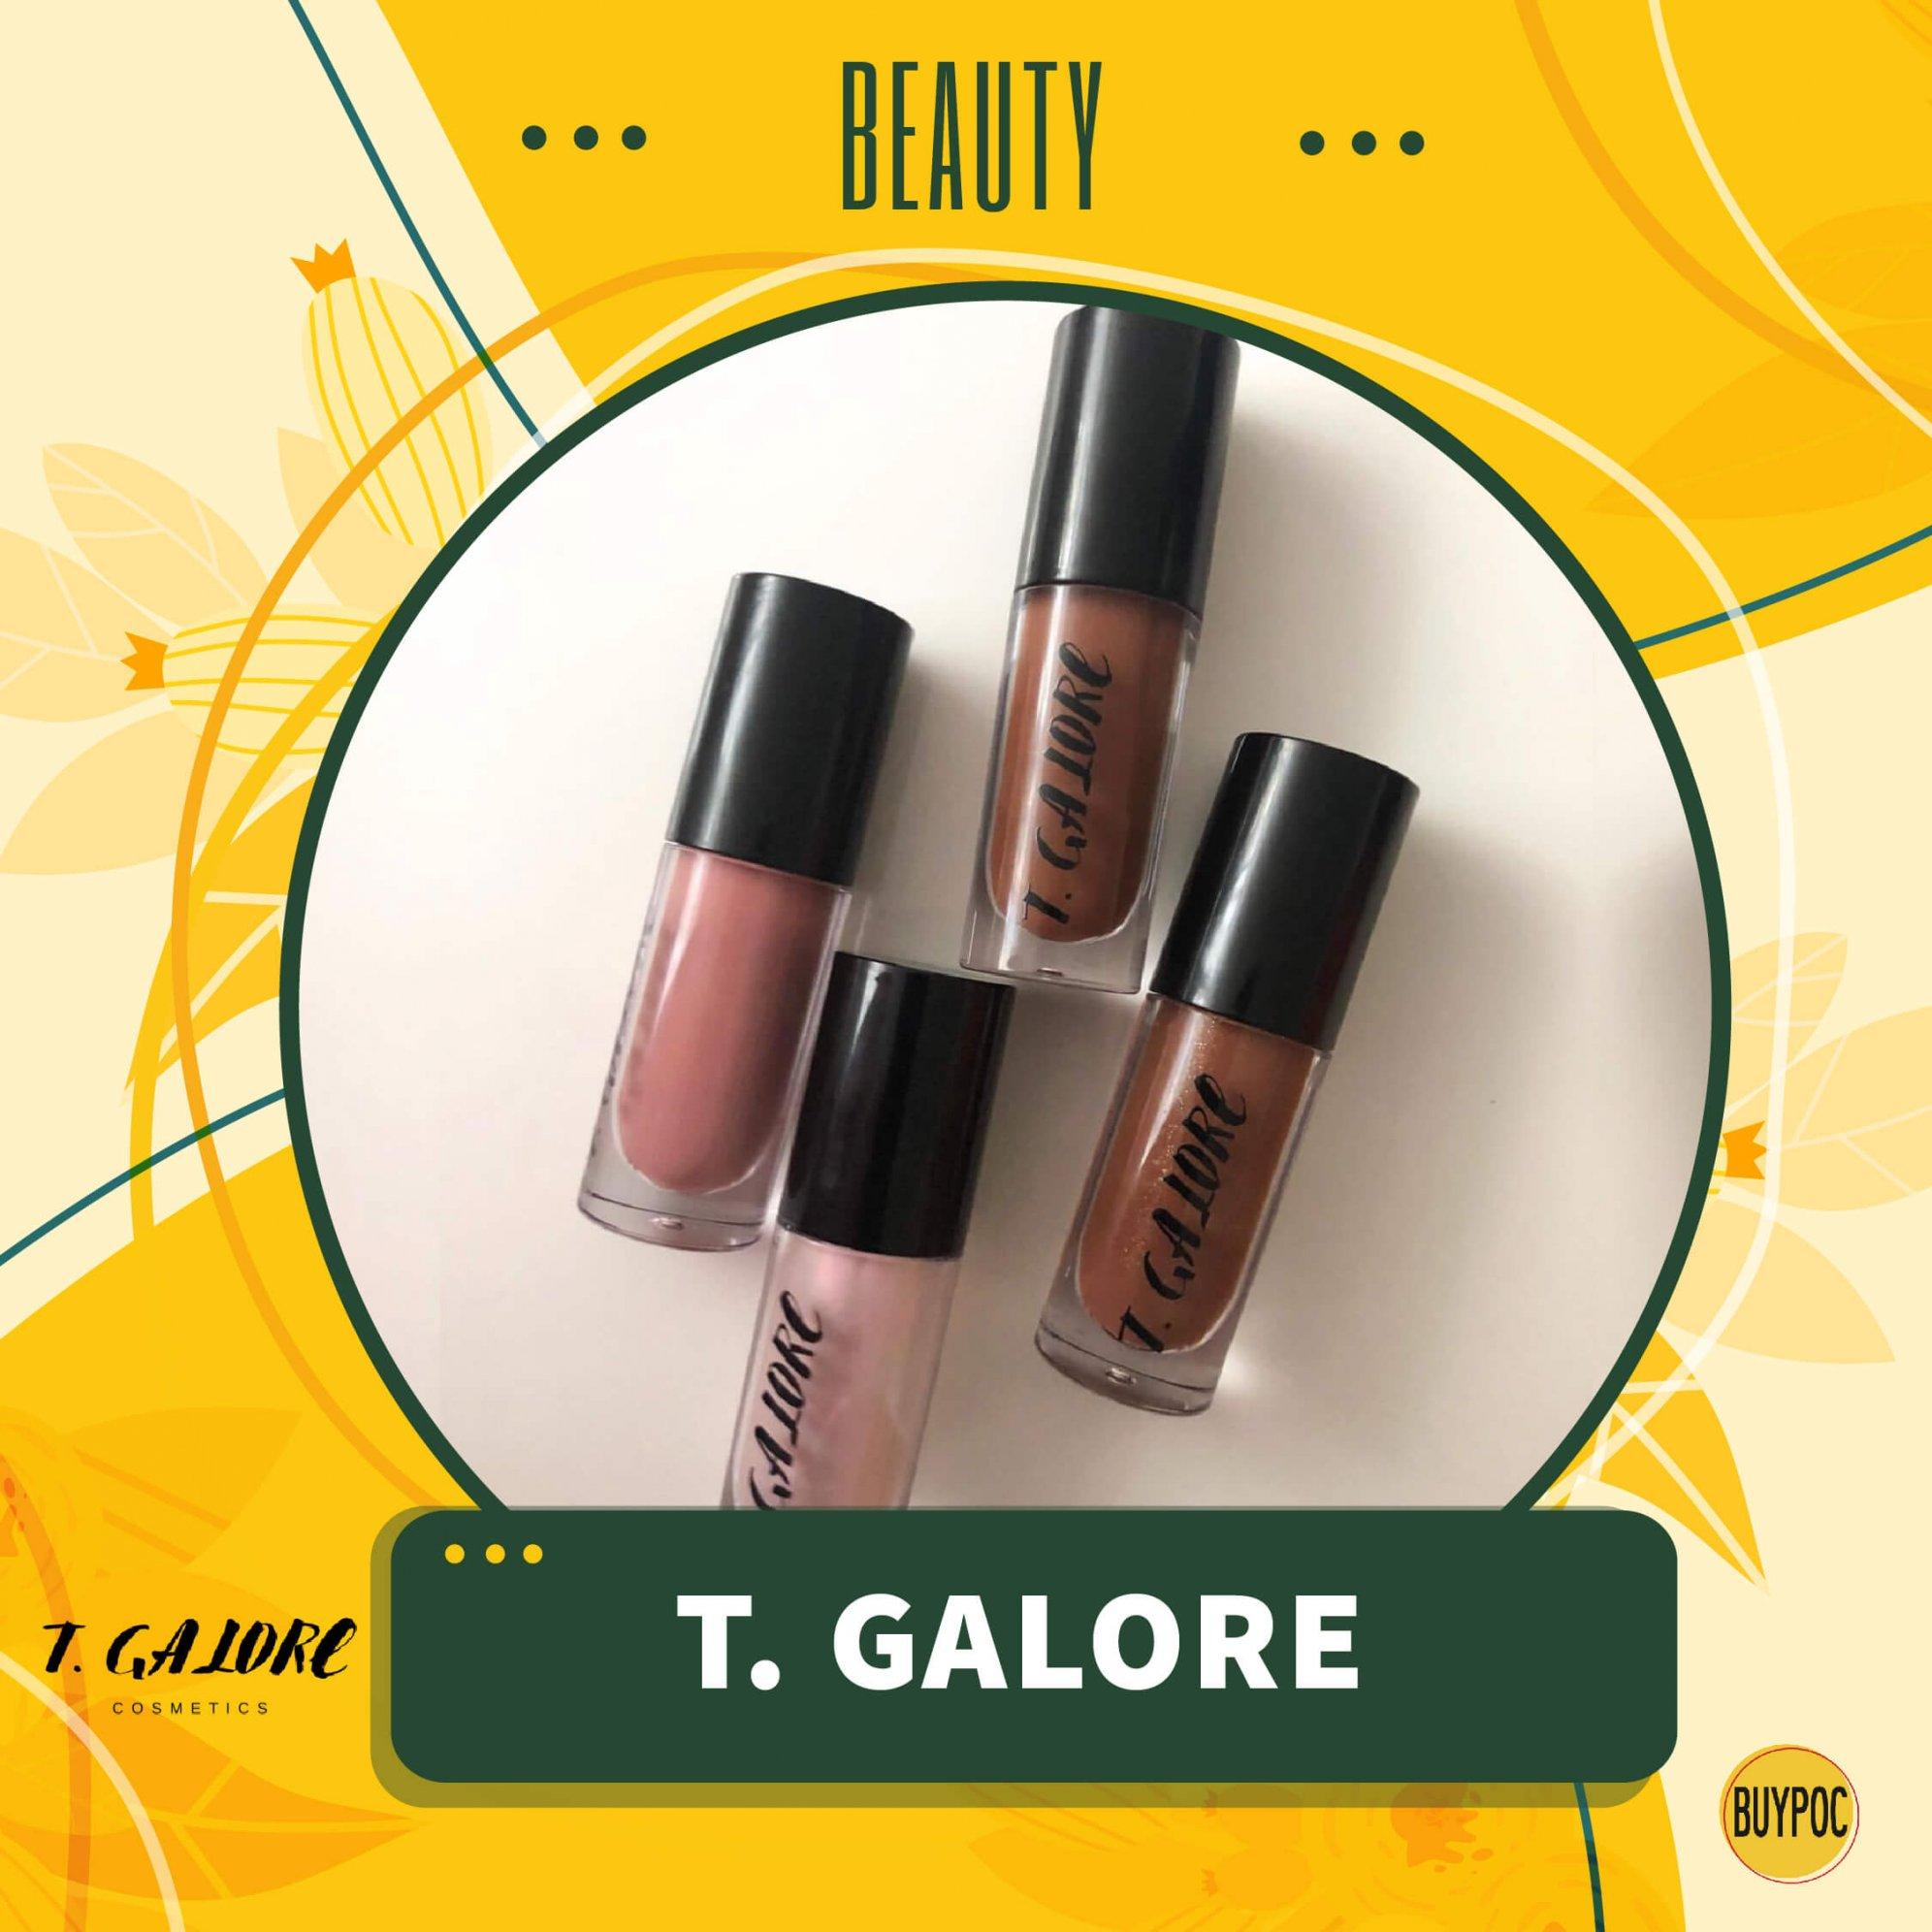 T. Galore